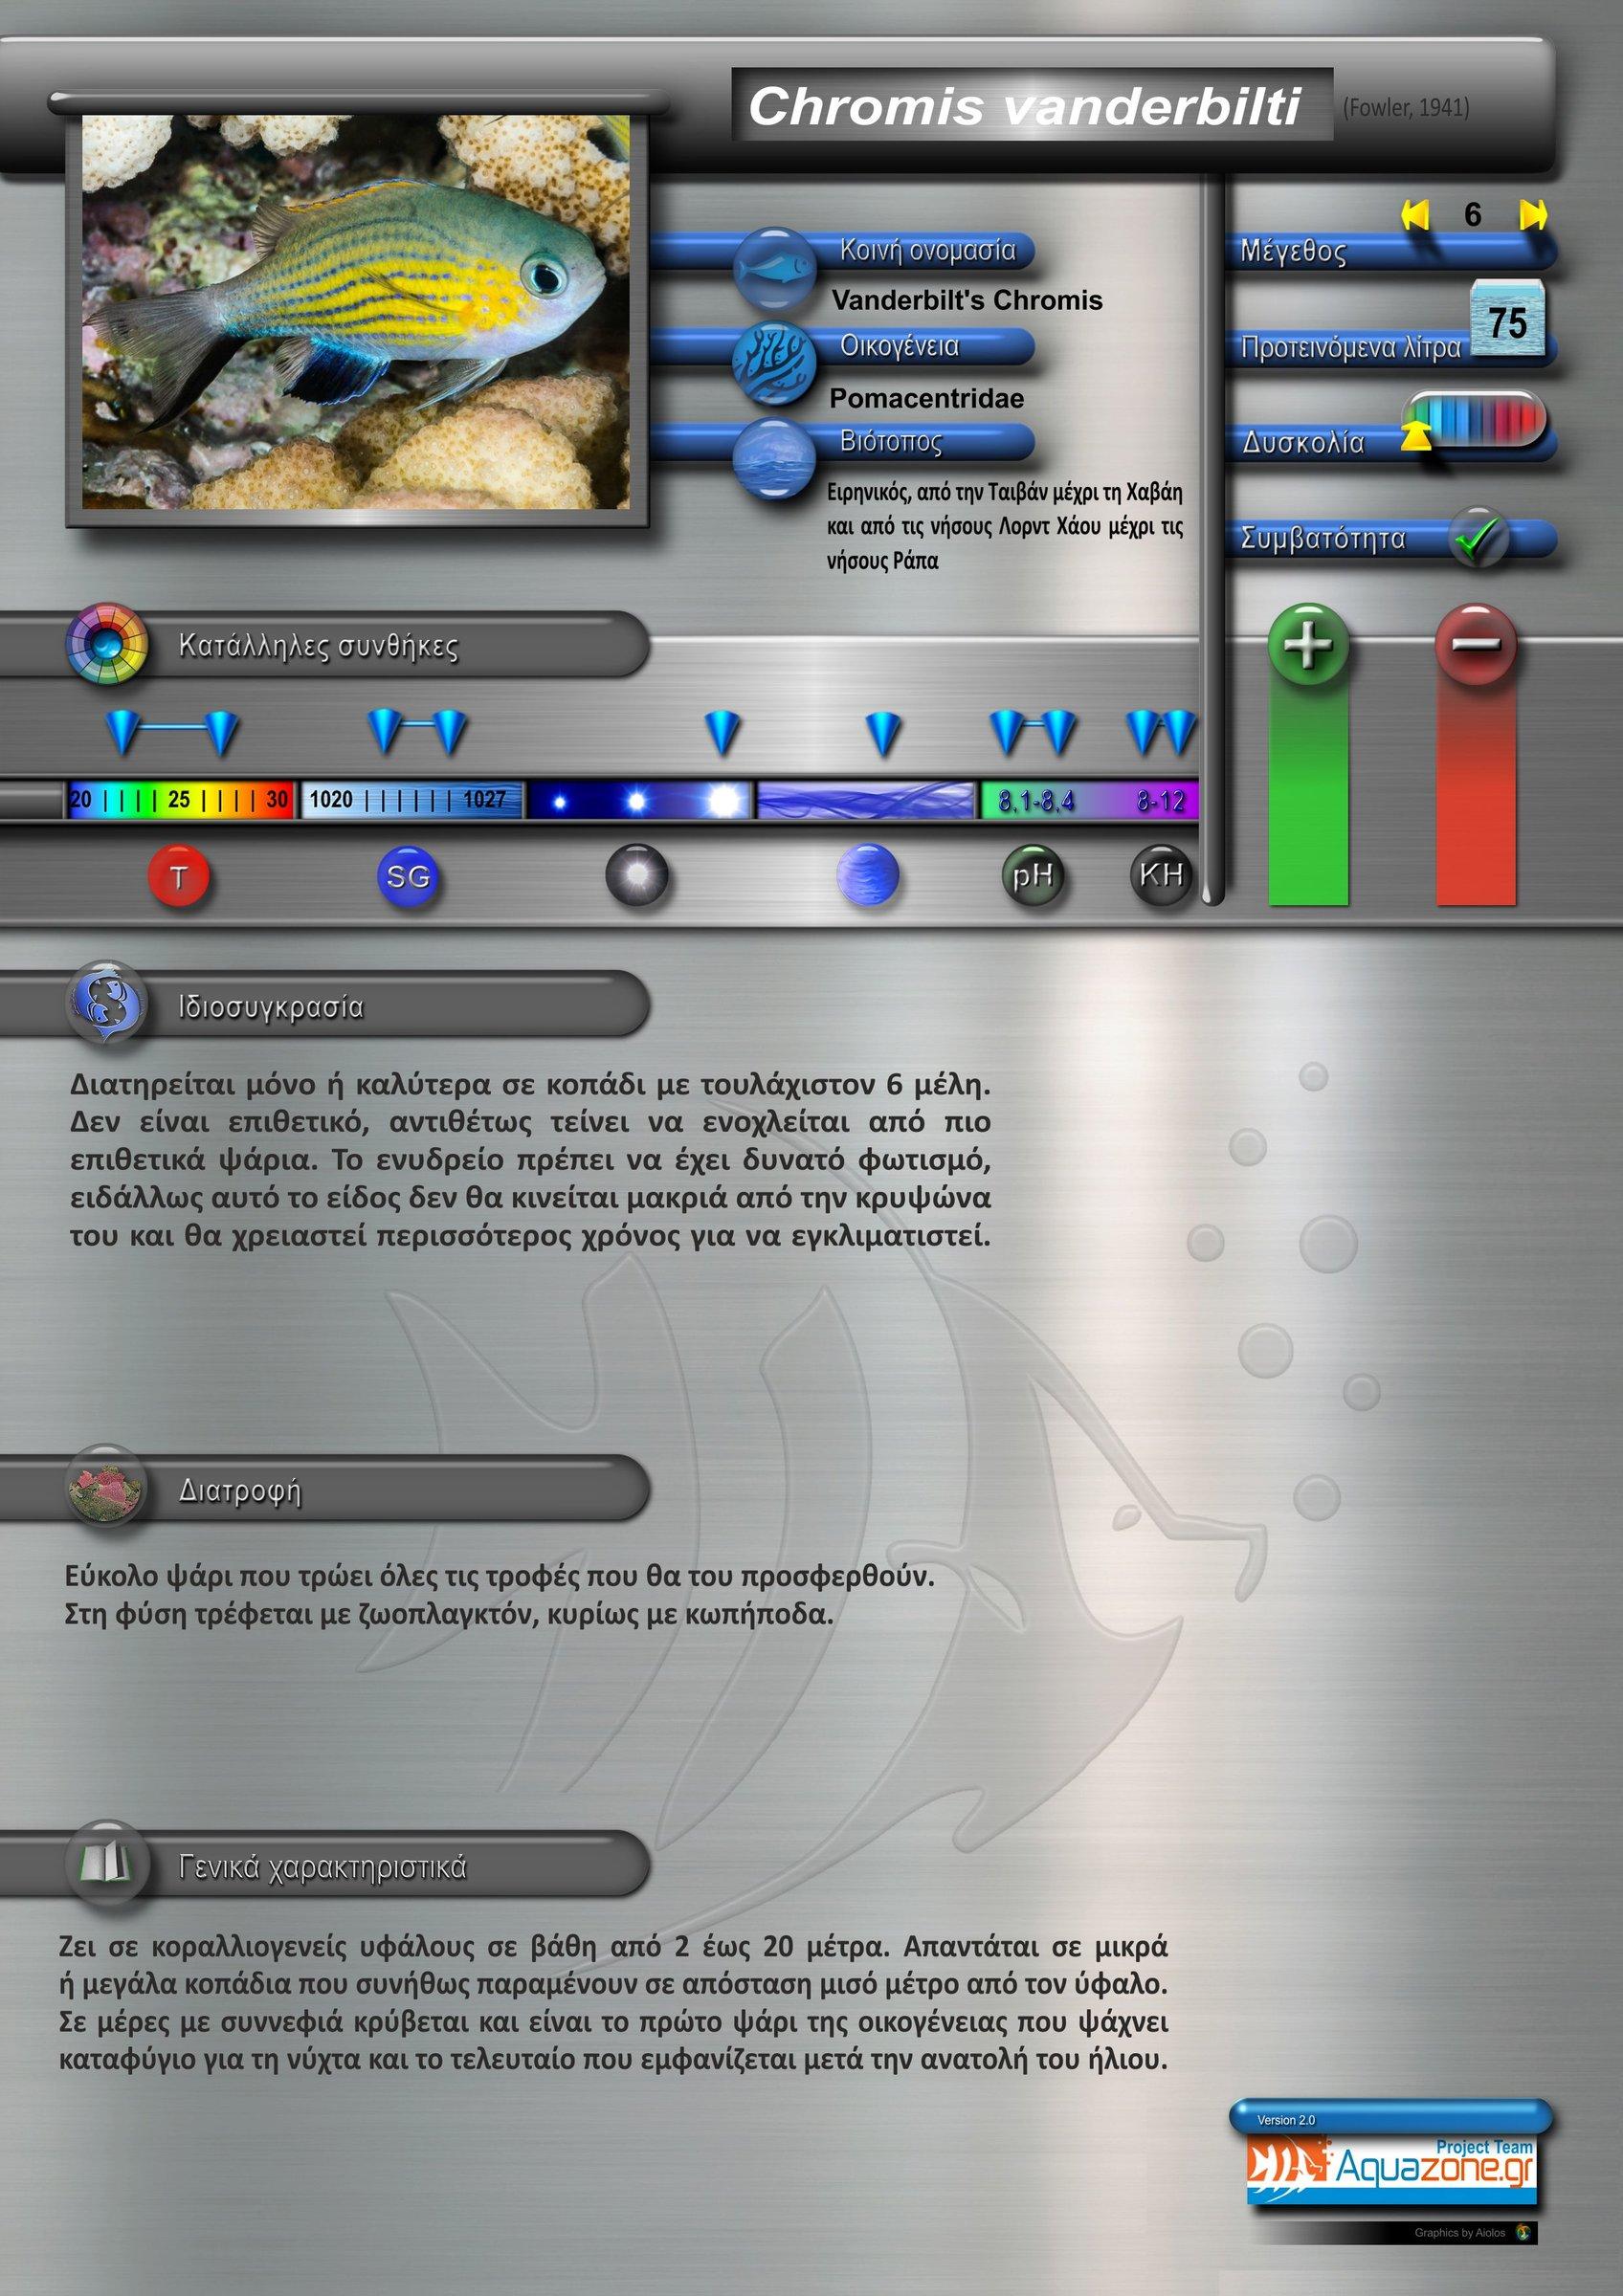 Chromis vanderbilti.jpg